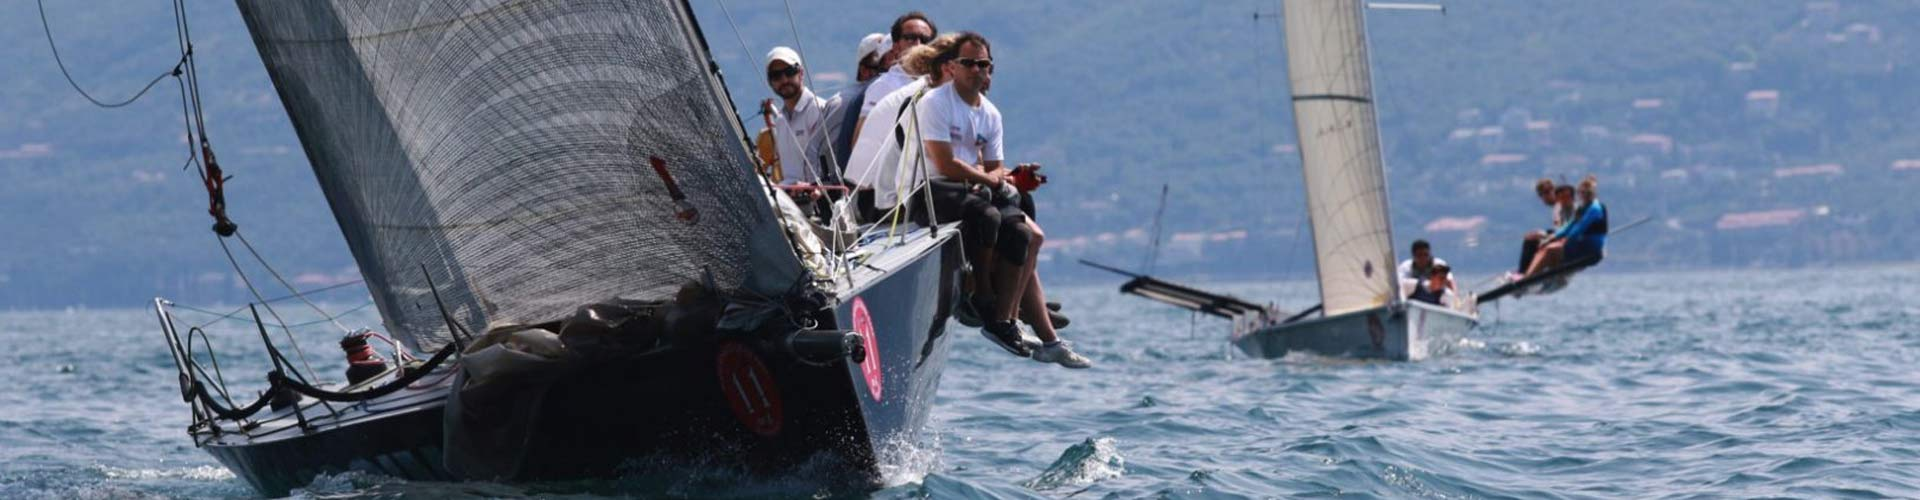 Trans Benaco Cruise Race, la parola ai vincitori